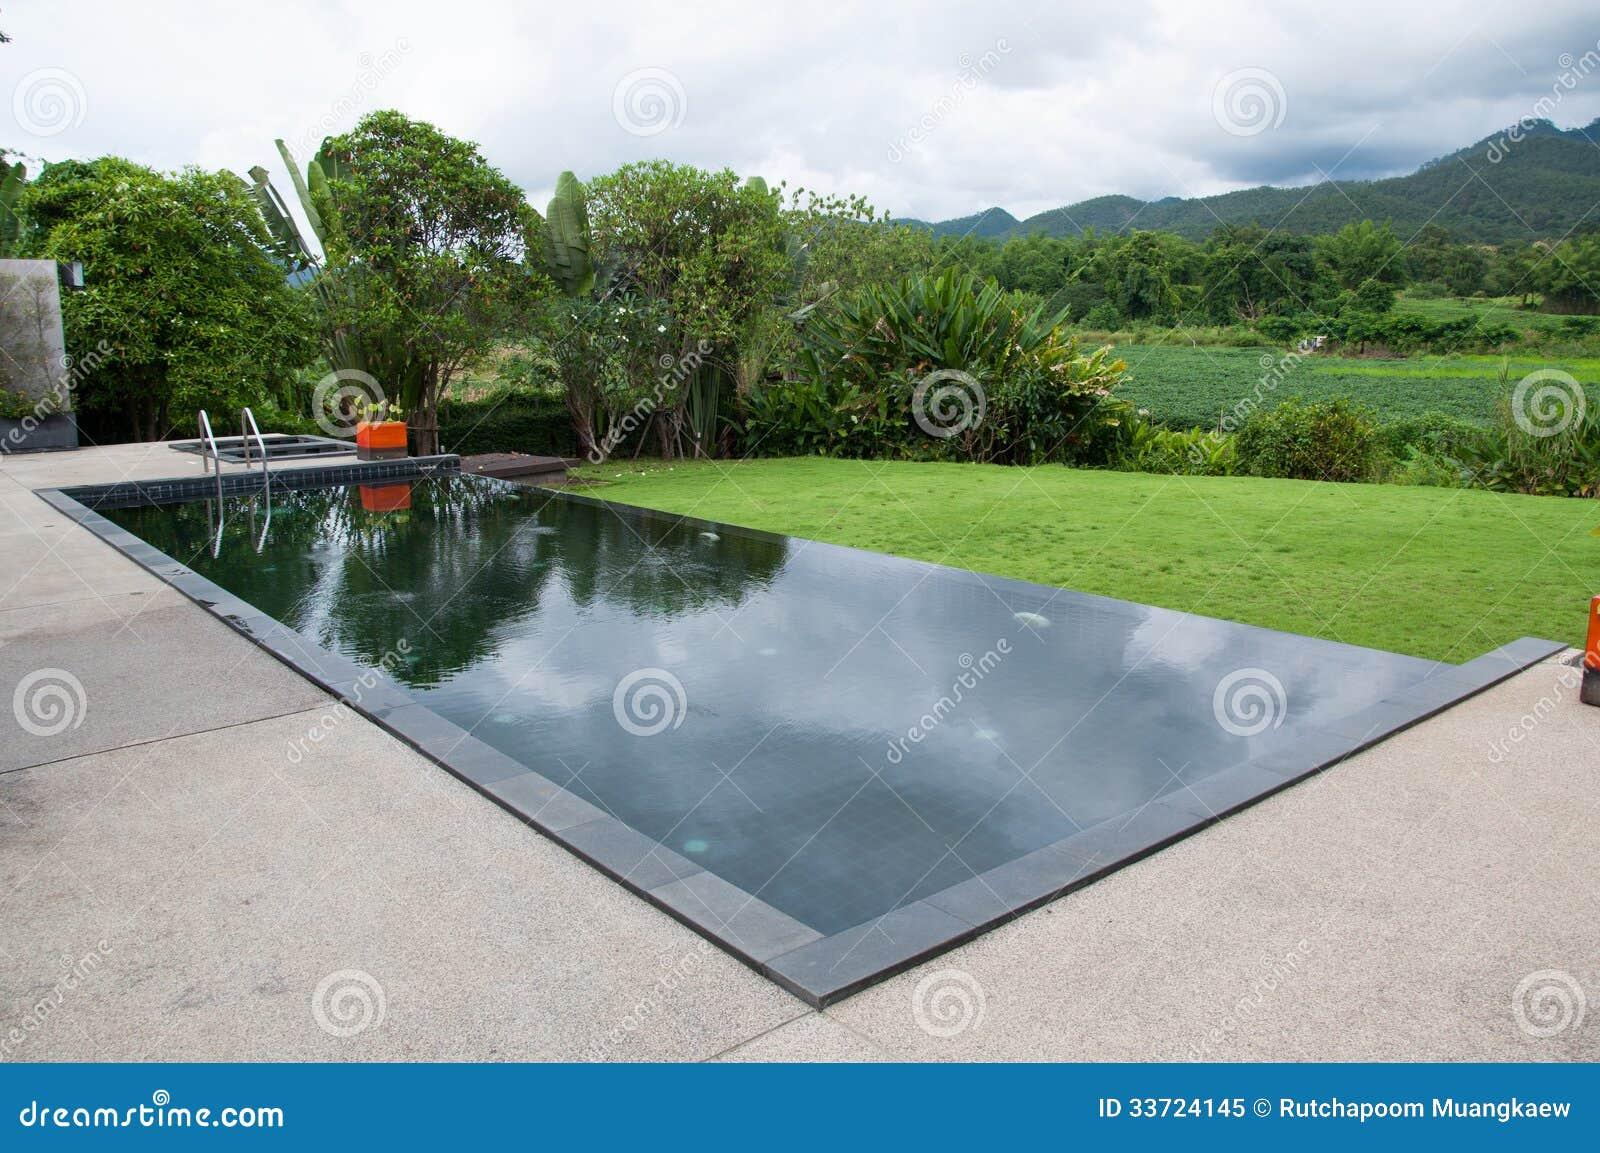 The Black Swimming Pool Royalty Free Stock Photo Image 33724145